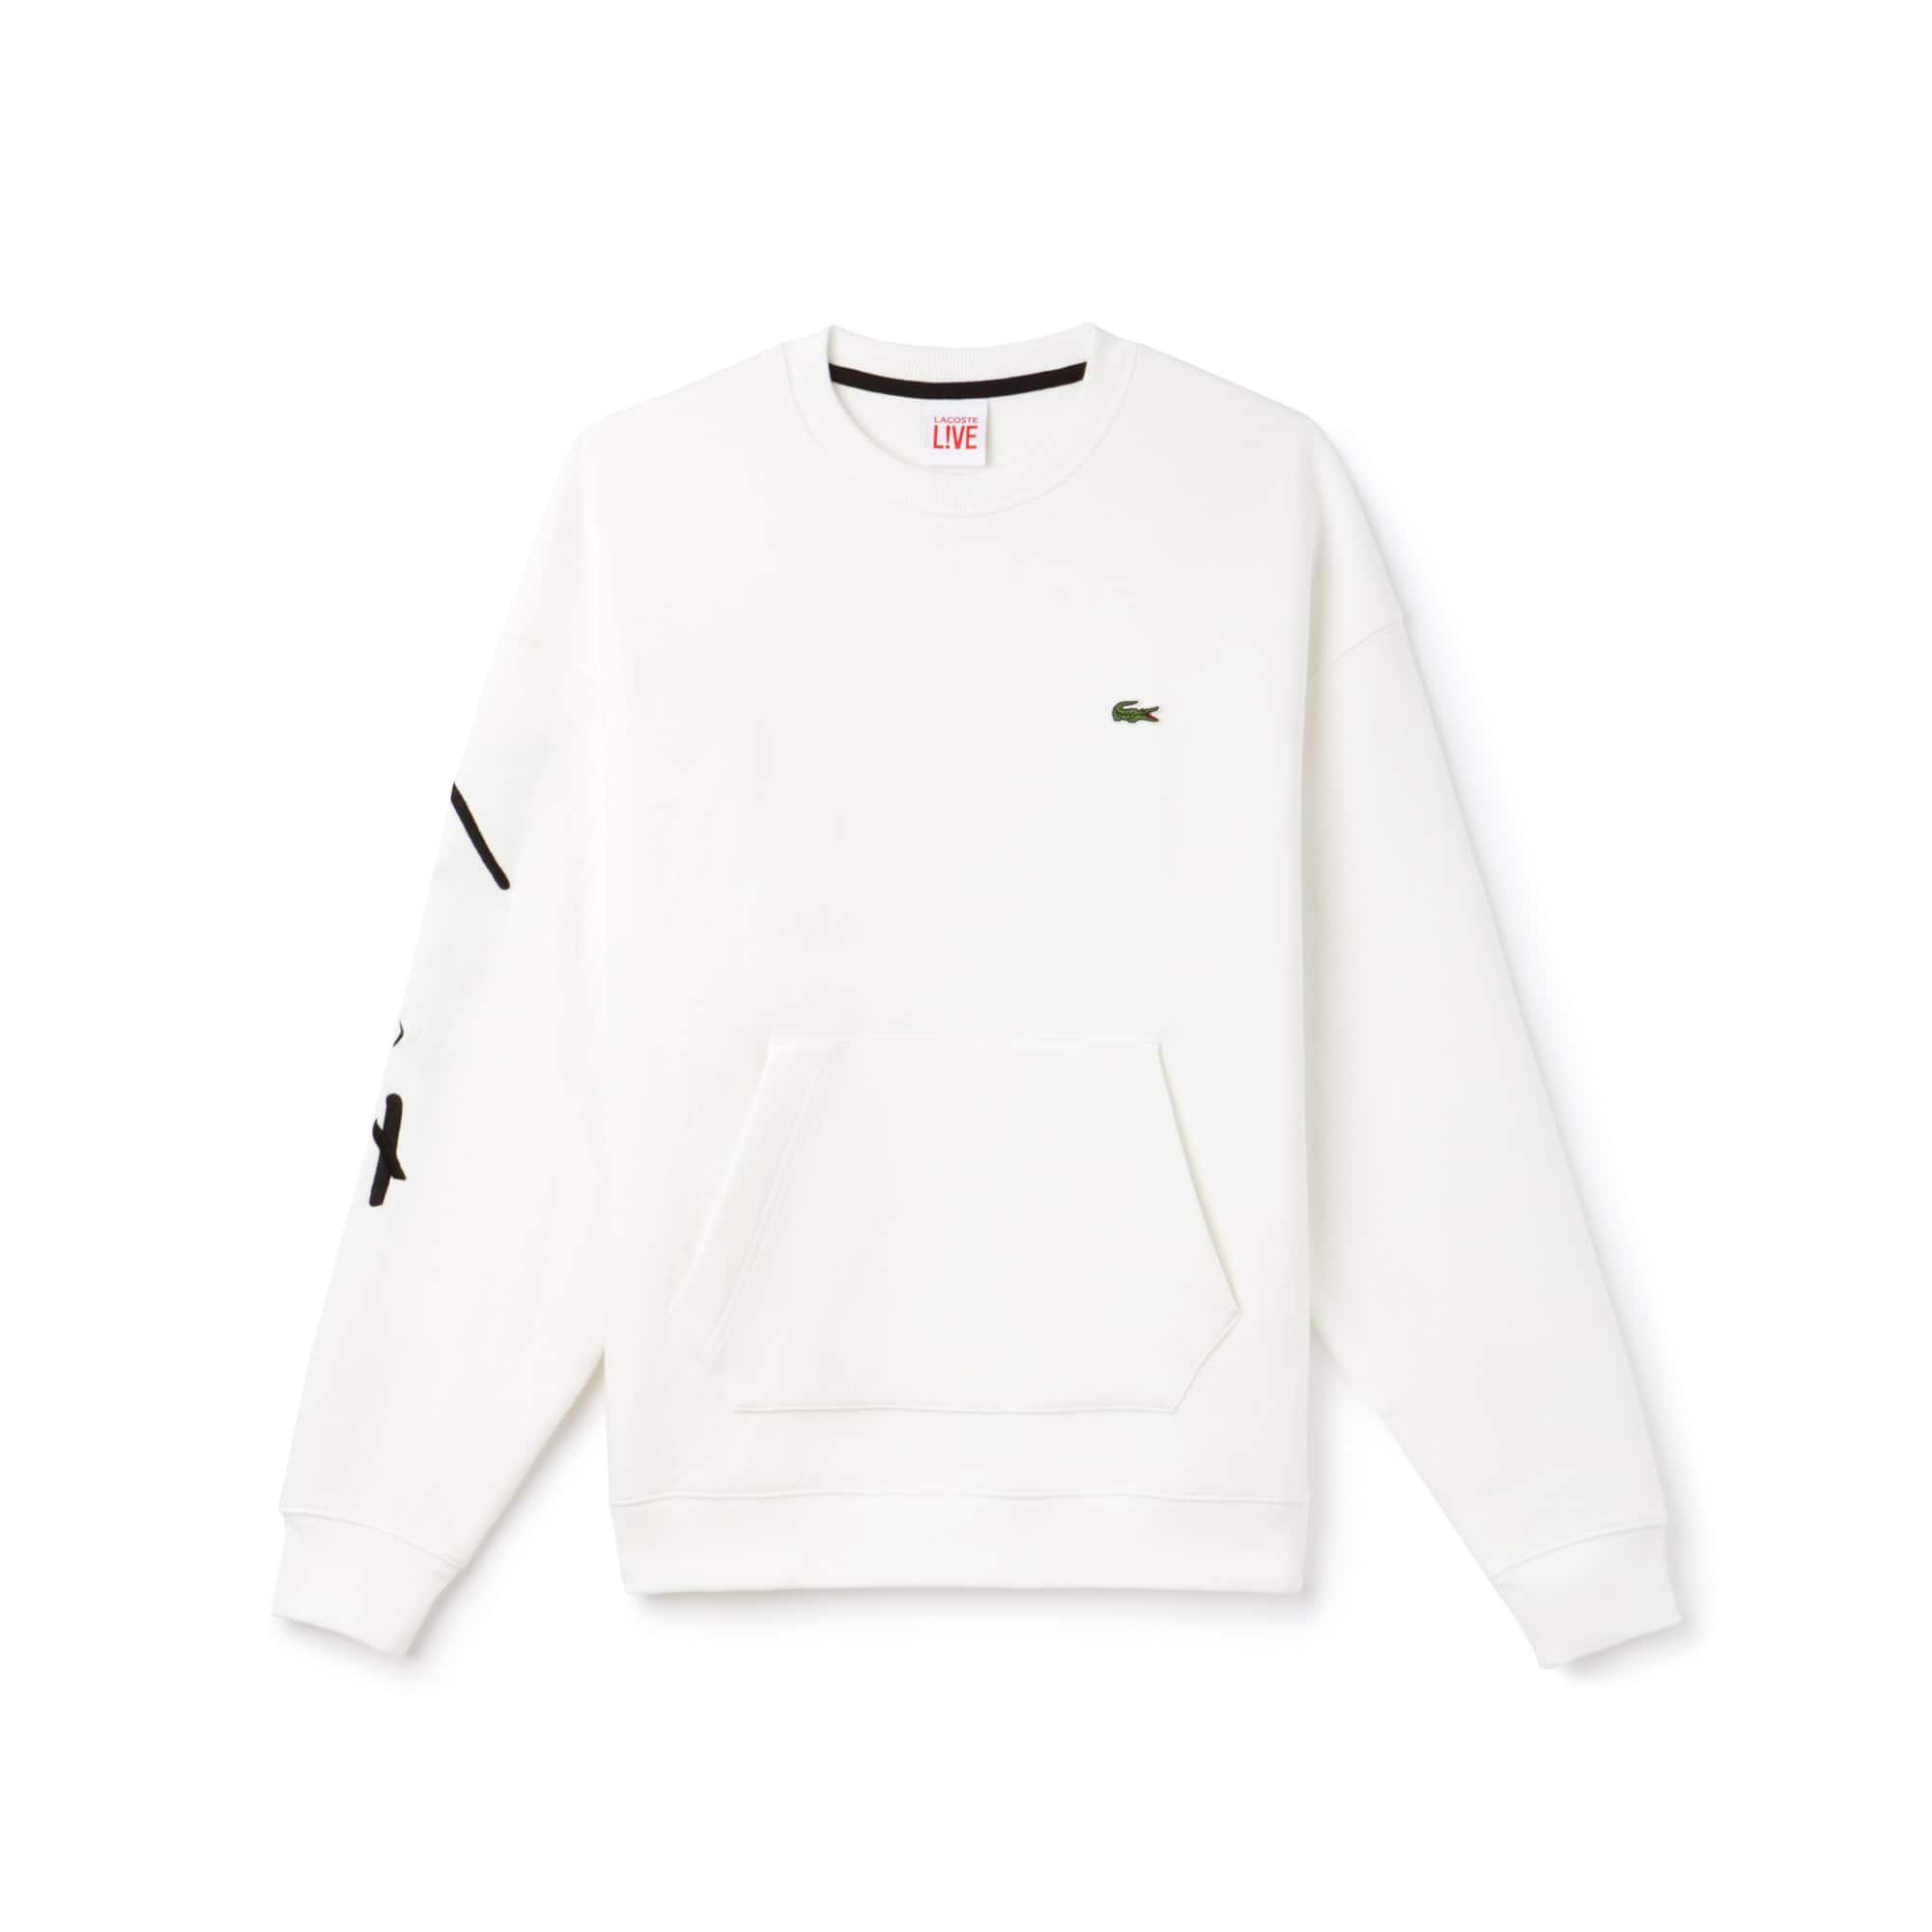 Lacoste LIVE系列圆领刺绣拉绒运动衫,男女皆宜